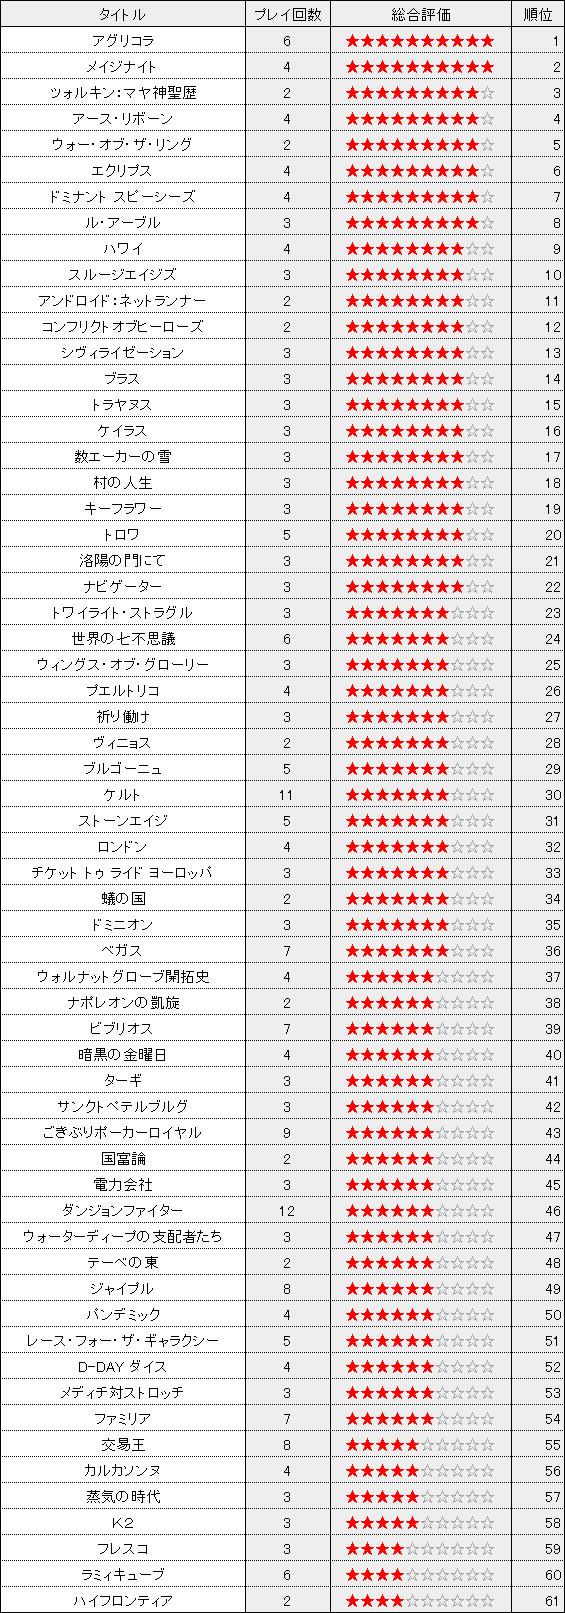 ranking130201.jpg